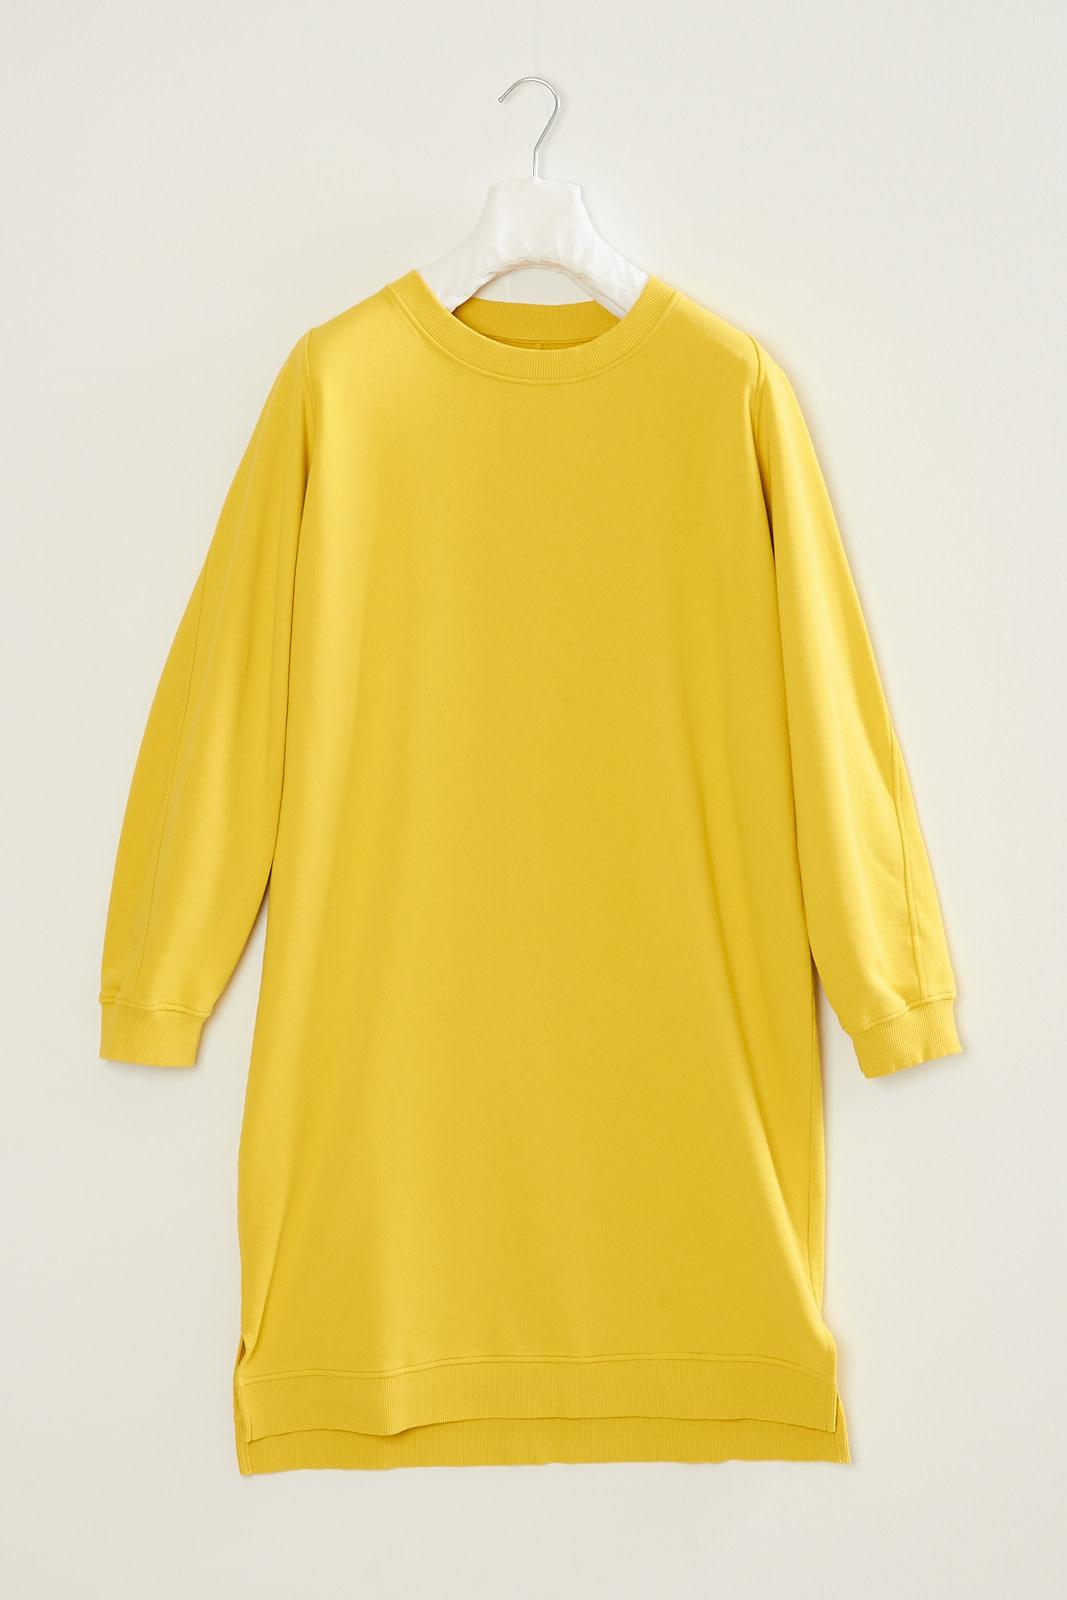 Humanoid - Hobo mel home dress